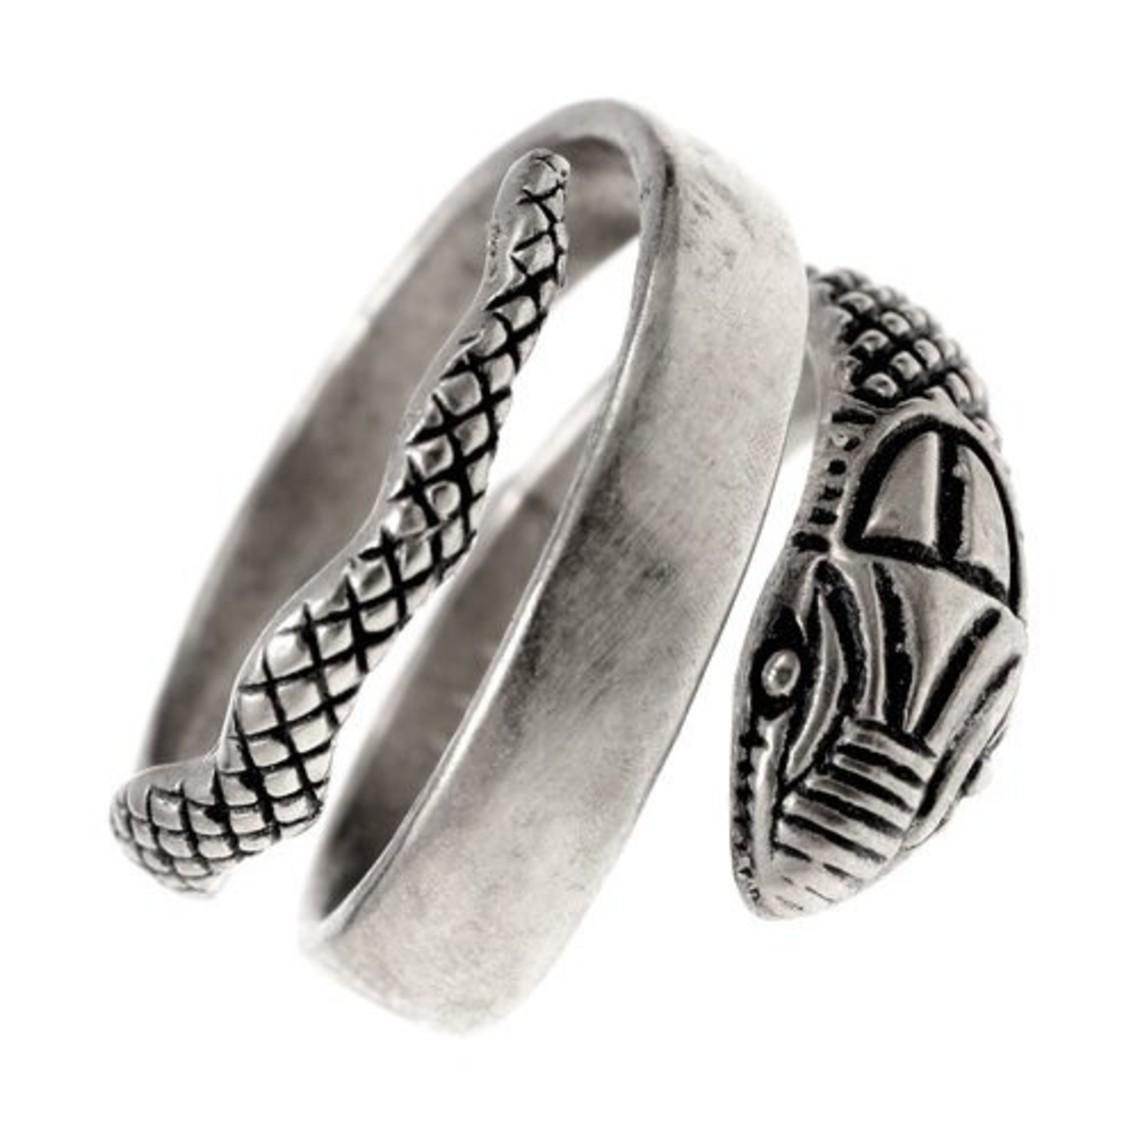 anillo de serpiente romana, bronce plateado